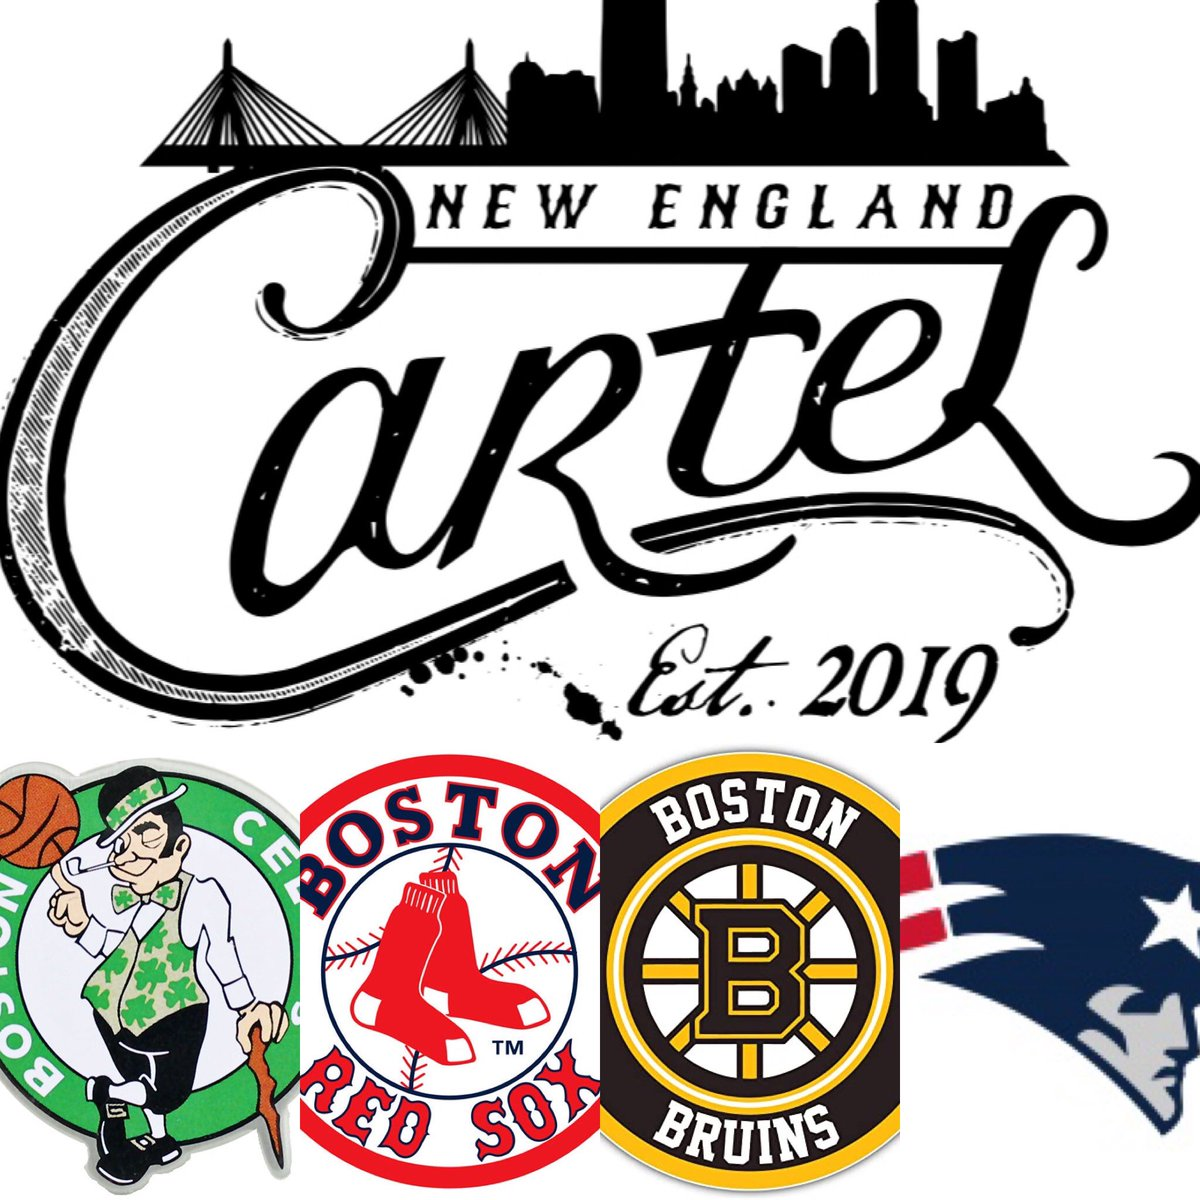 Boston's fifth team 🏀 ⚾️ 🏒 🏈 🥊   #NewEnglandCartel https://t.co/hifuyfiXvb